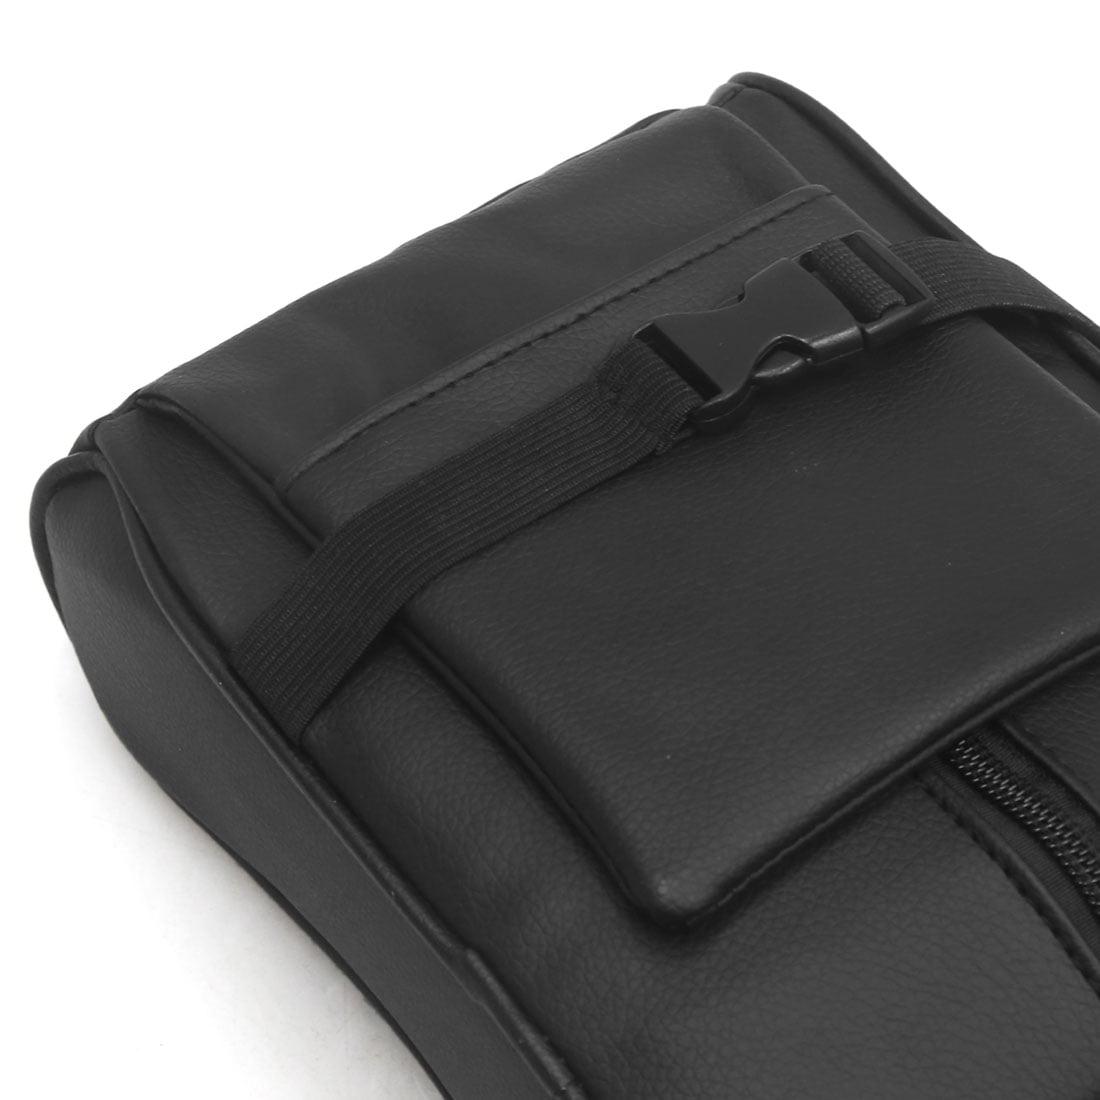 Black Faux Leather Memory Foam Car Auto Center Console Armrest Cushion Pad - image 2 of 4